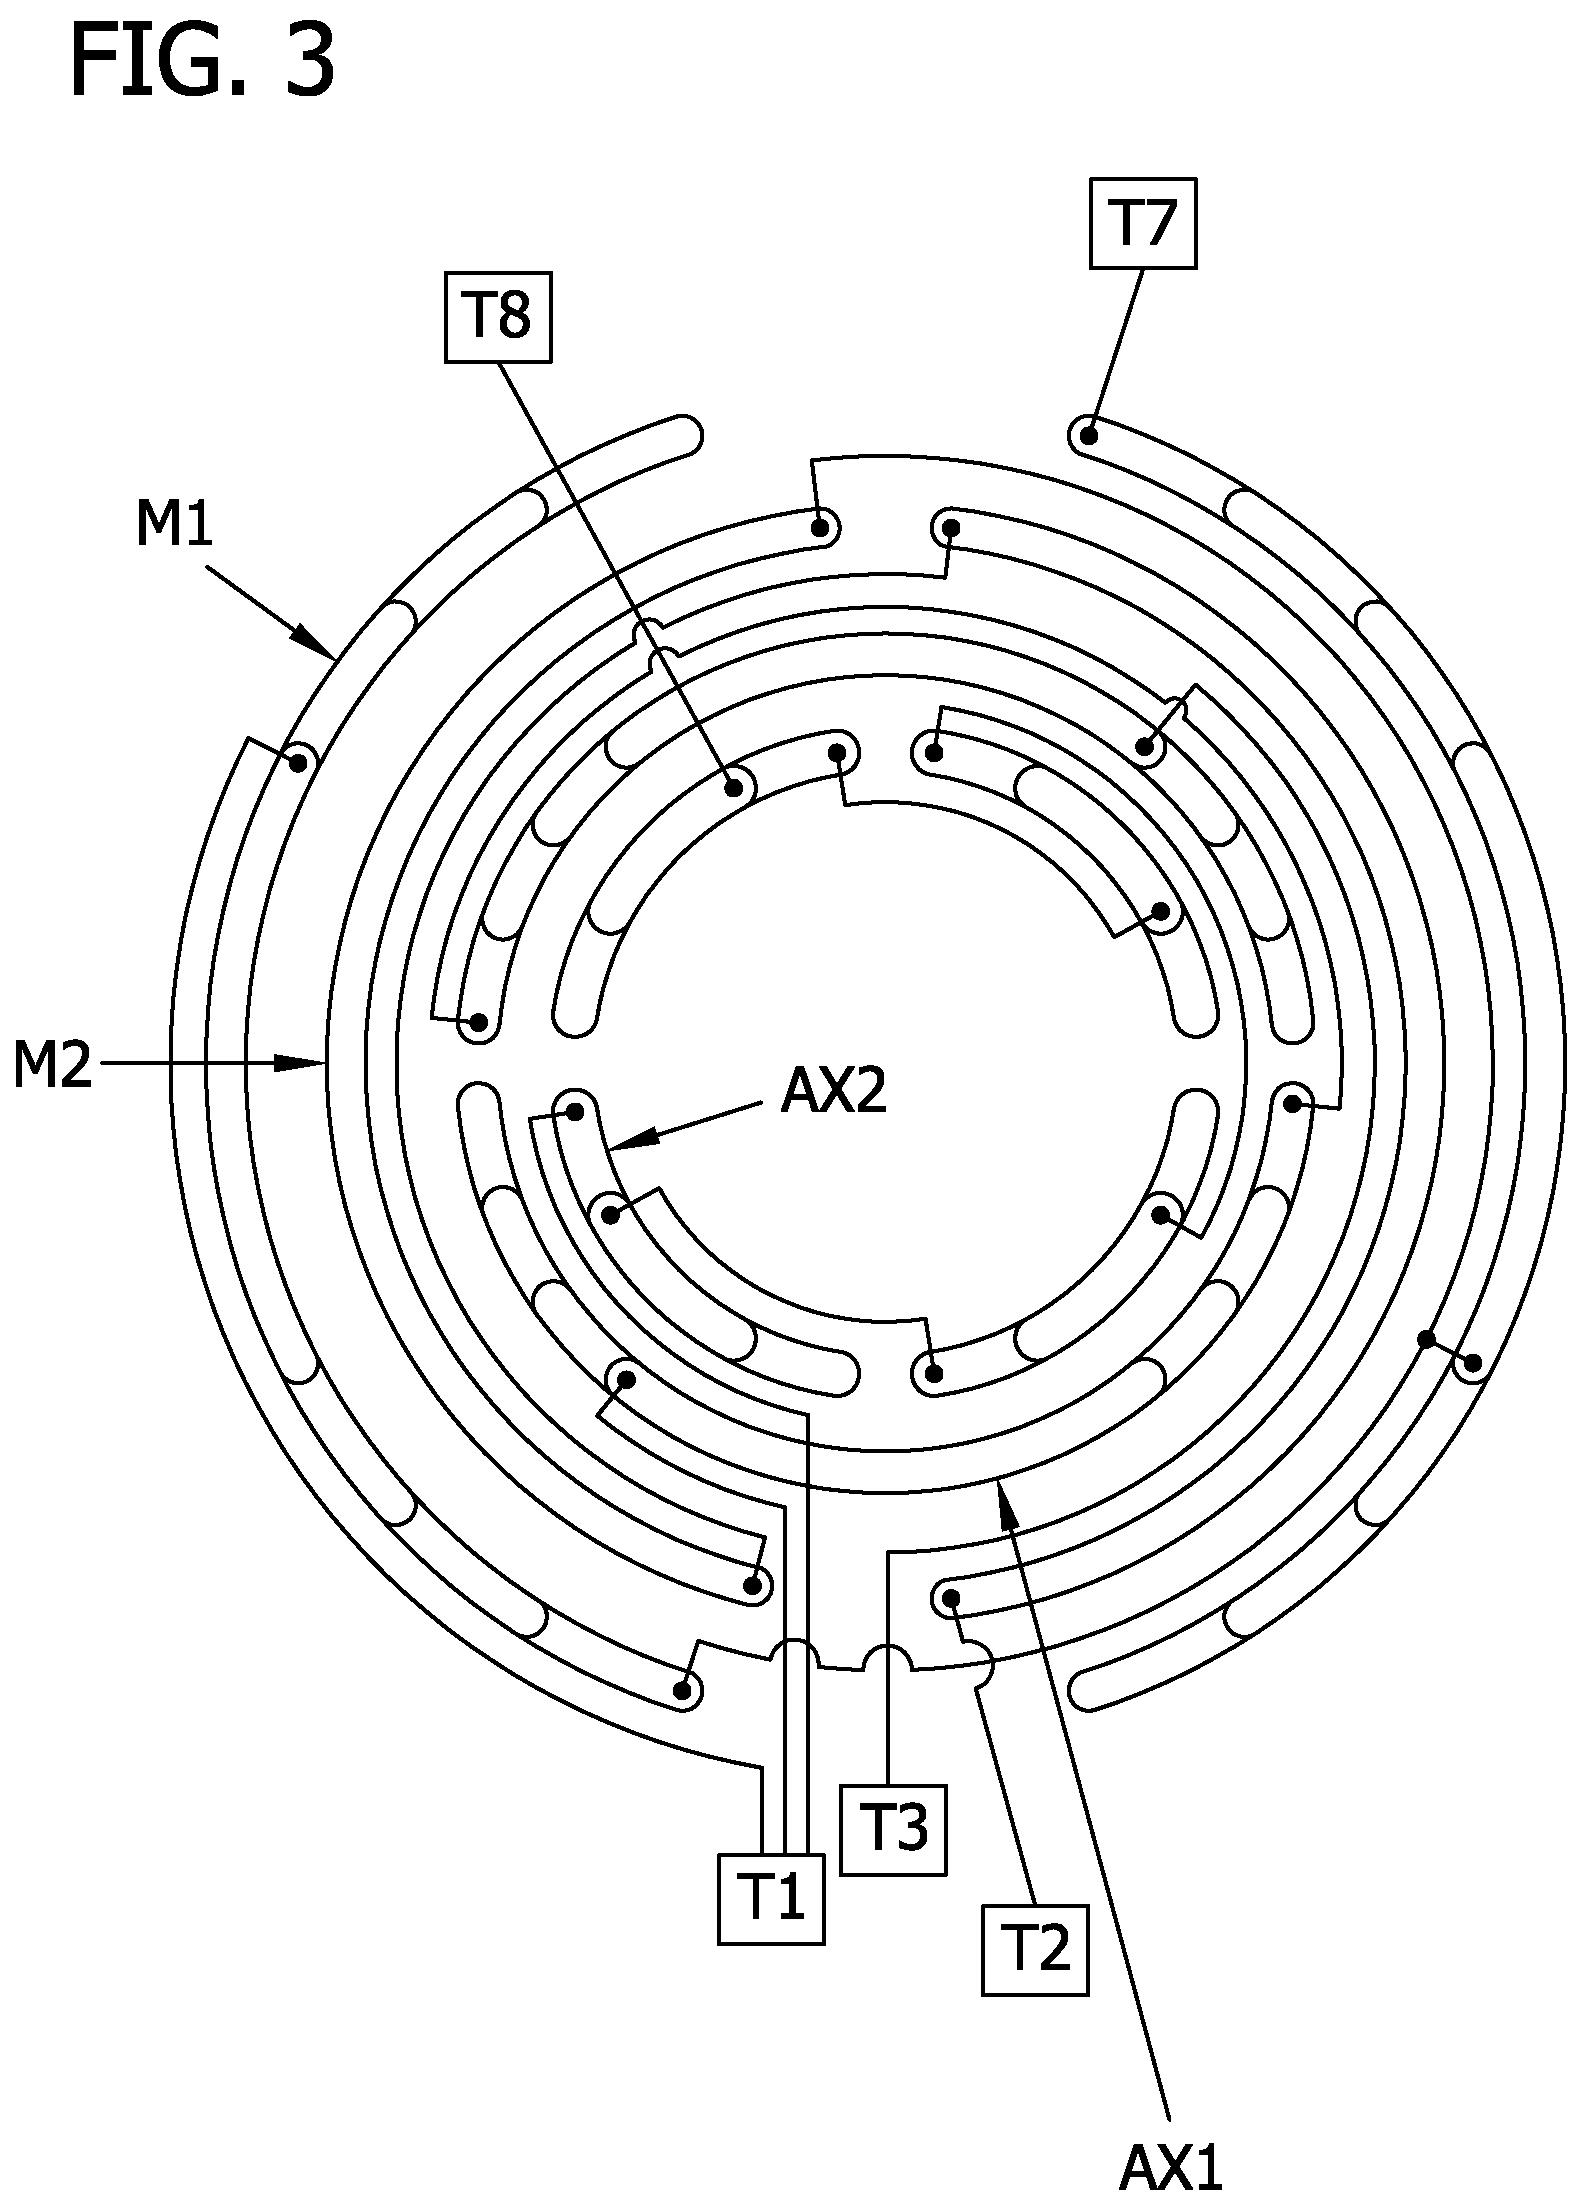 tags: #2 speed wiper motor wiring#2 speed motor wiring diagram#2 speed  electric motor wiring diagram#2 speed motor schematic#three speed motor  wiring#6 lead